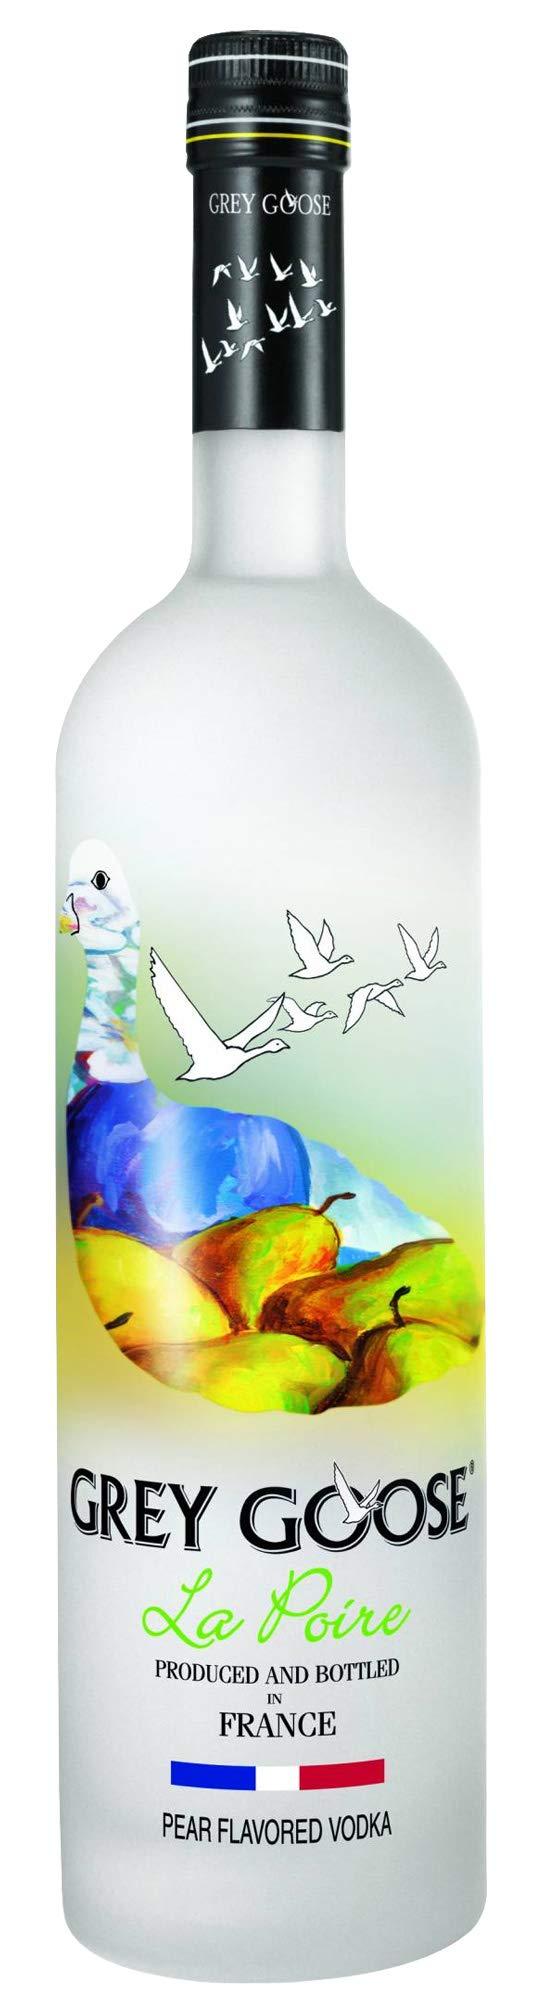 Grey Goose Vodka La Poire 80 Proof, 750 ml